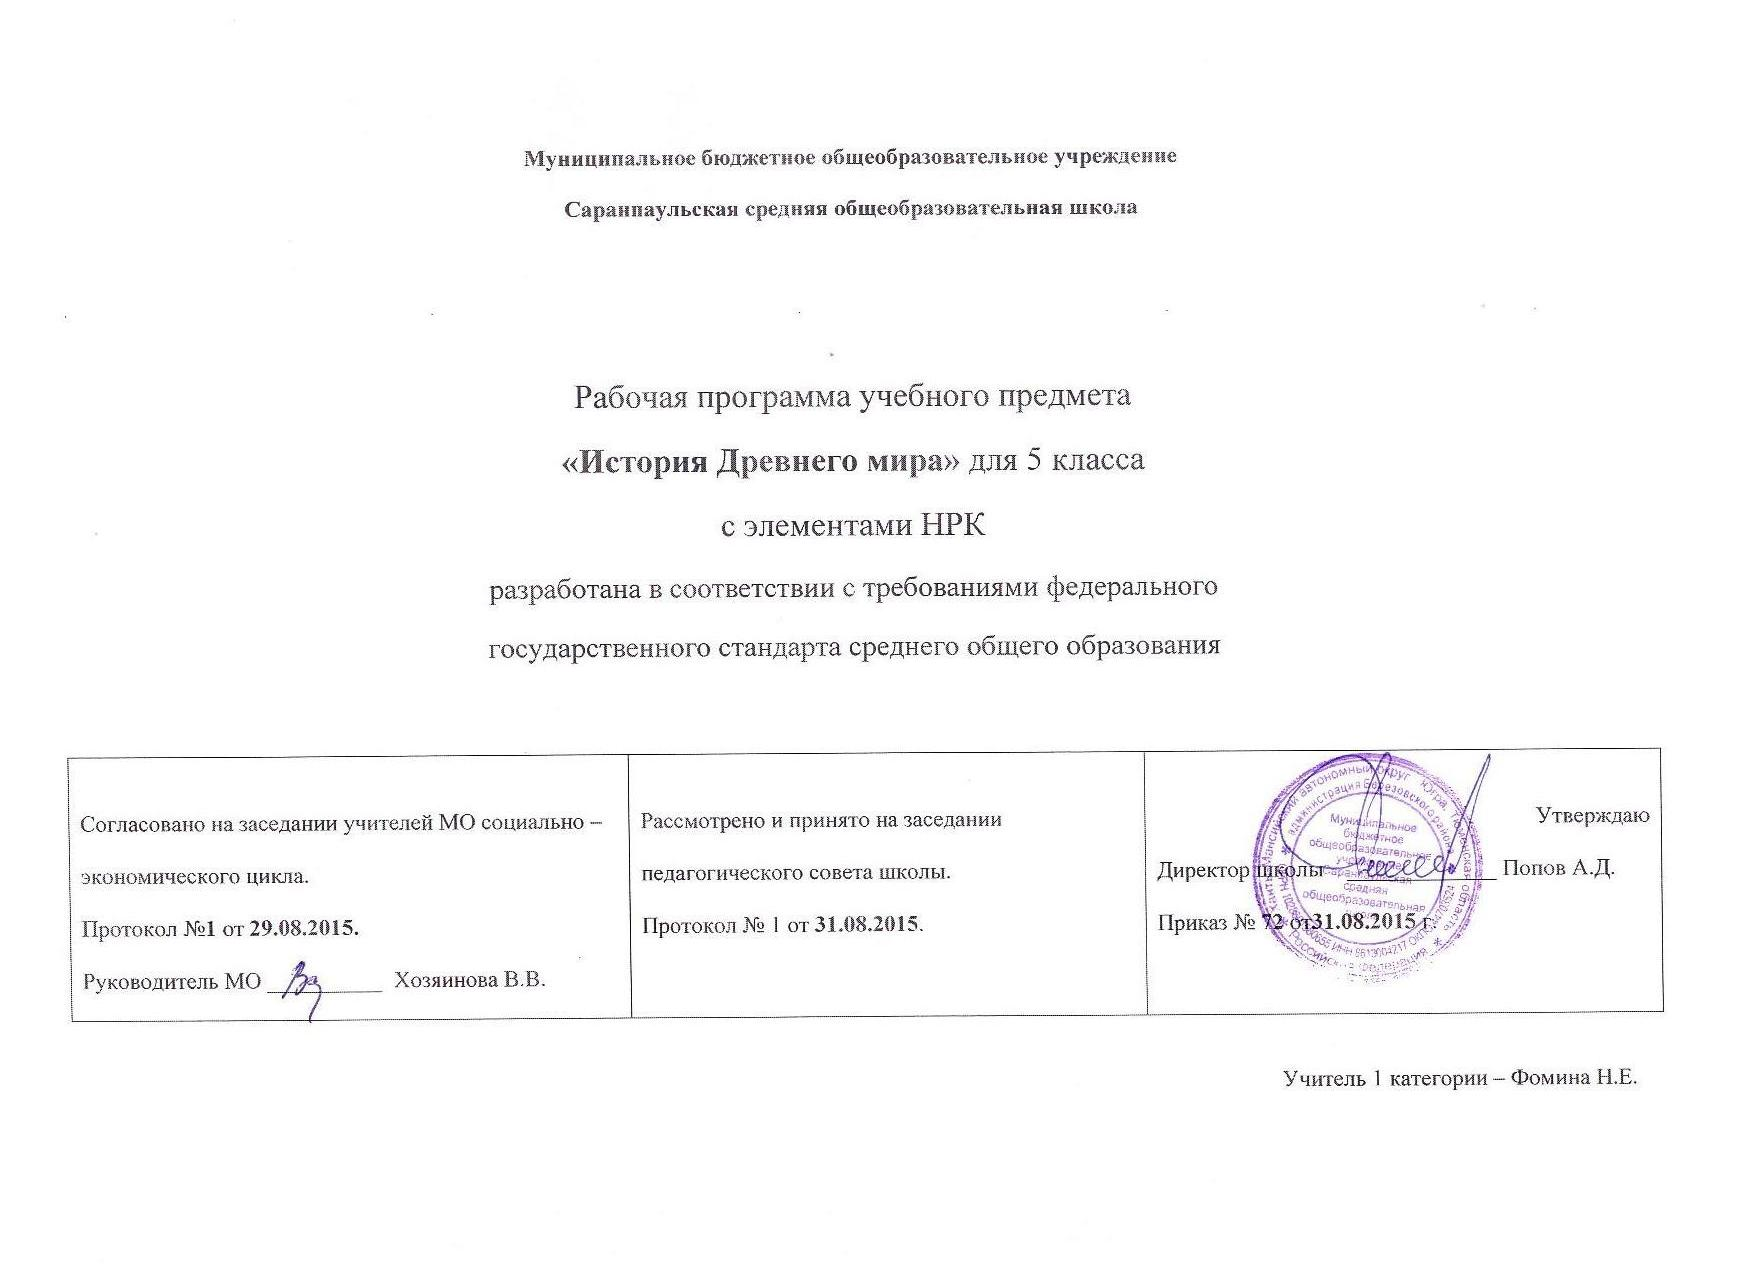 C:\Documents and Settings\1\Рабочий стол\Изображение 002.jpg